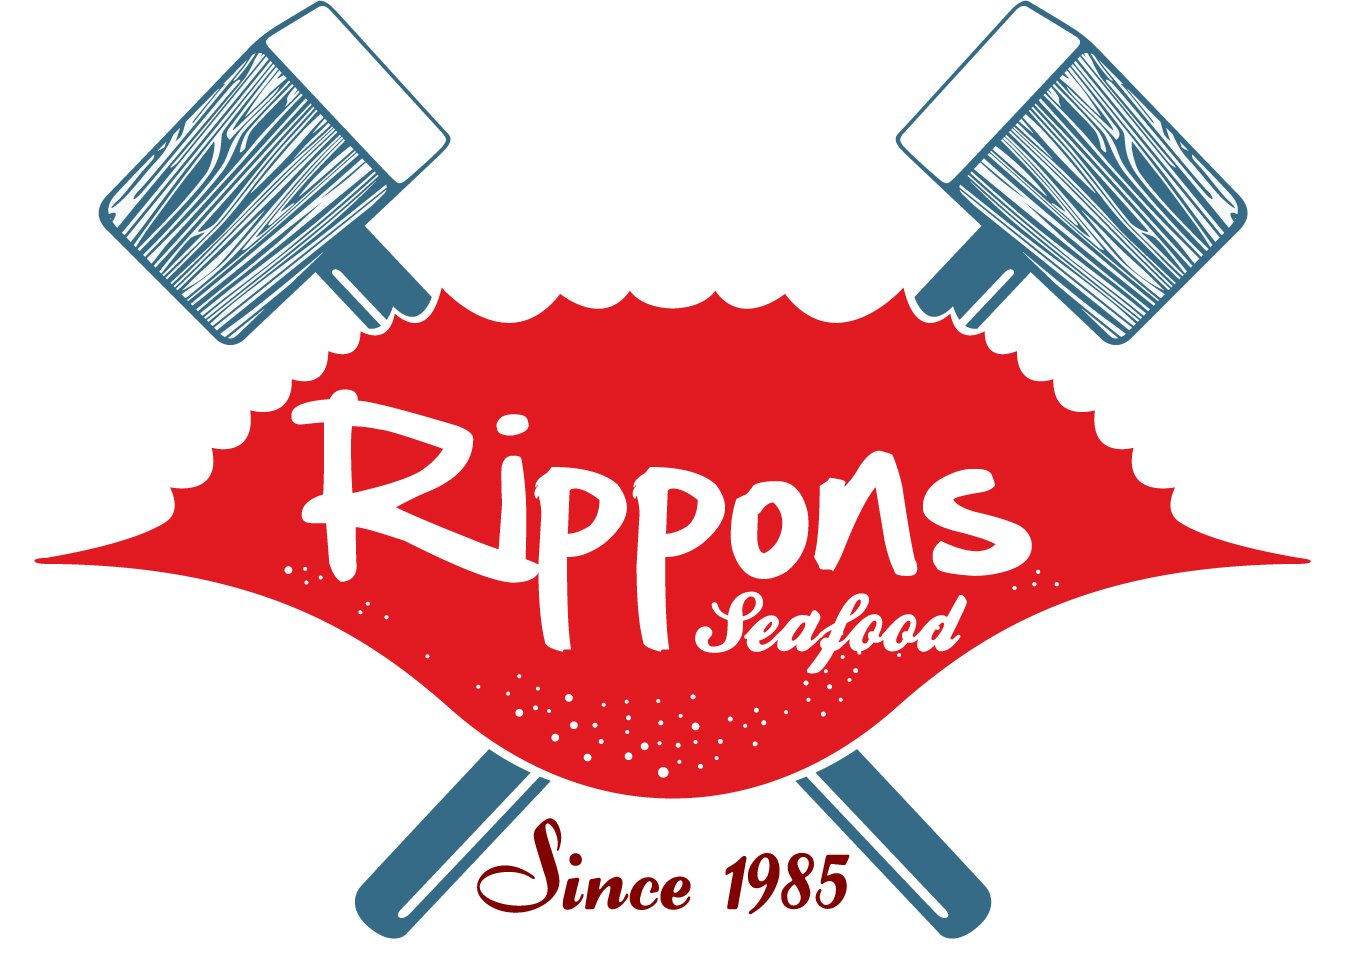 Rippons.jpg